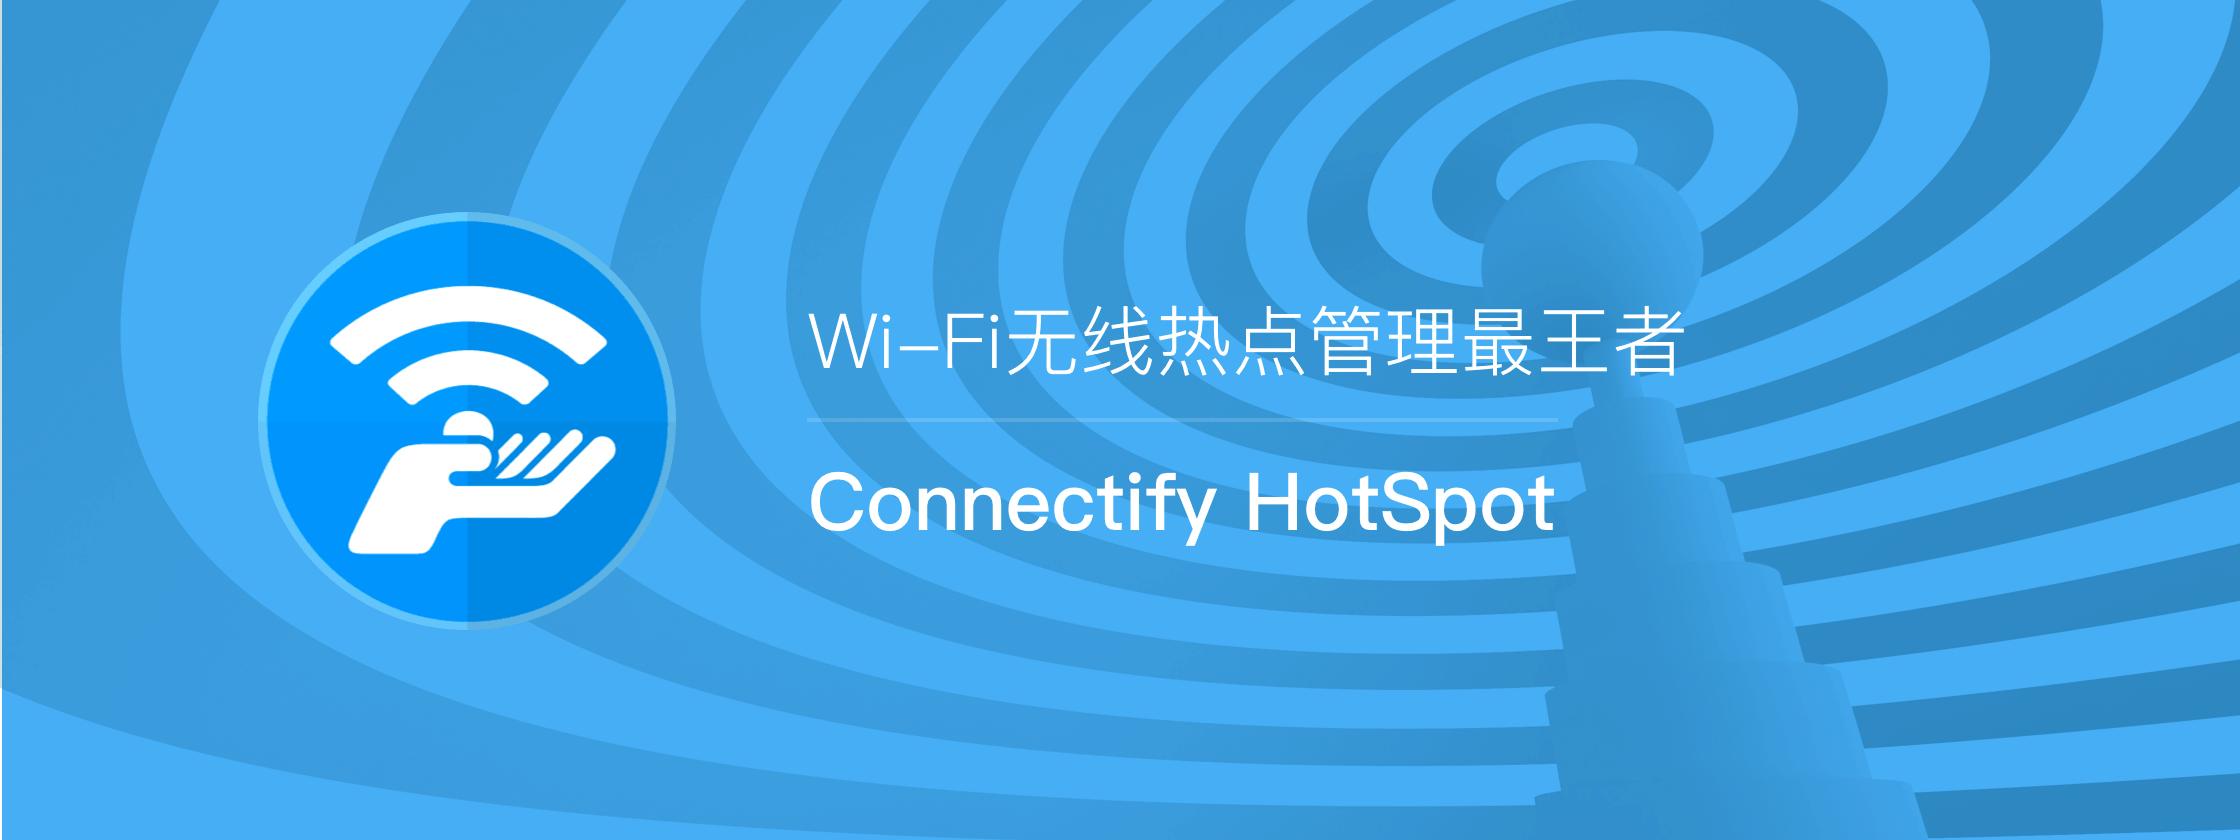 Connectify HotSpot –  Wi-Fi无线热点管理最王者